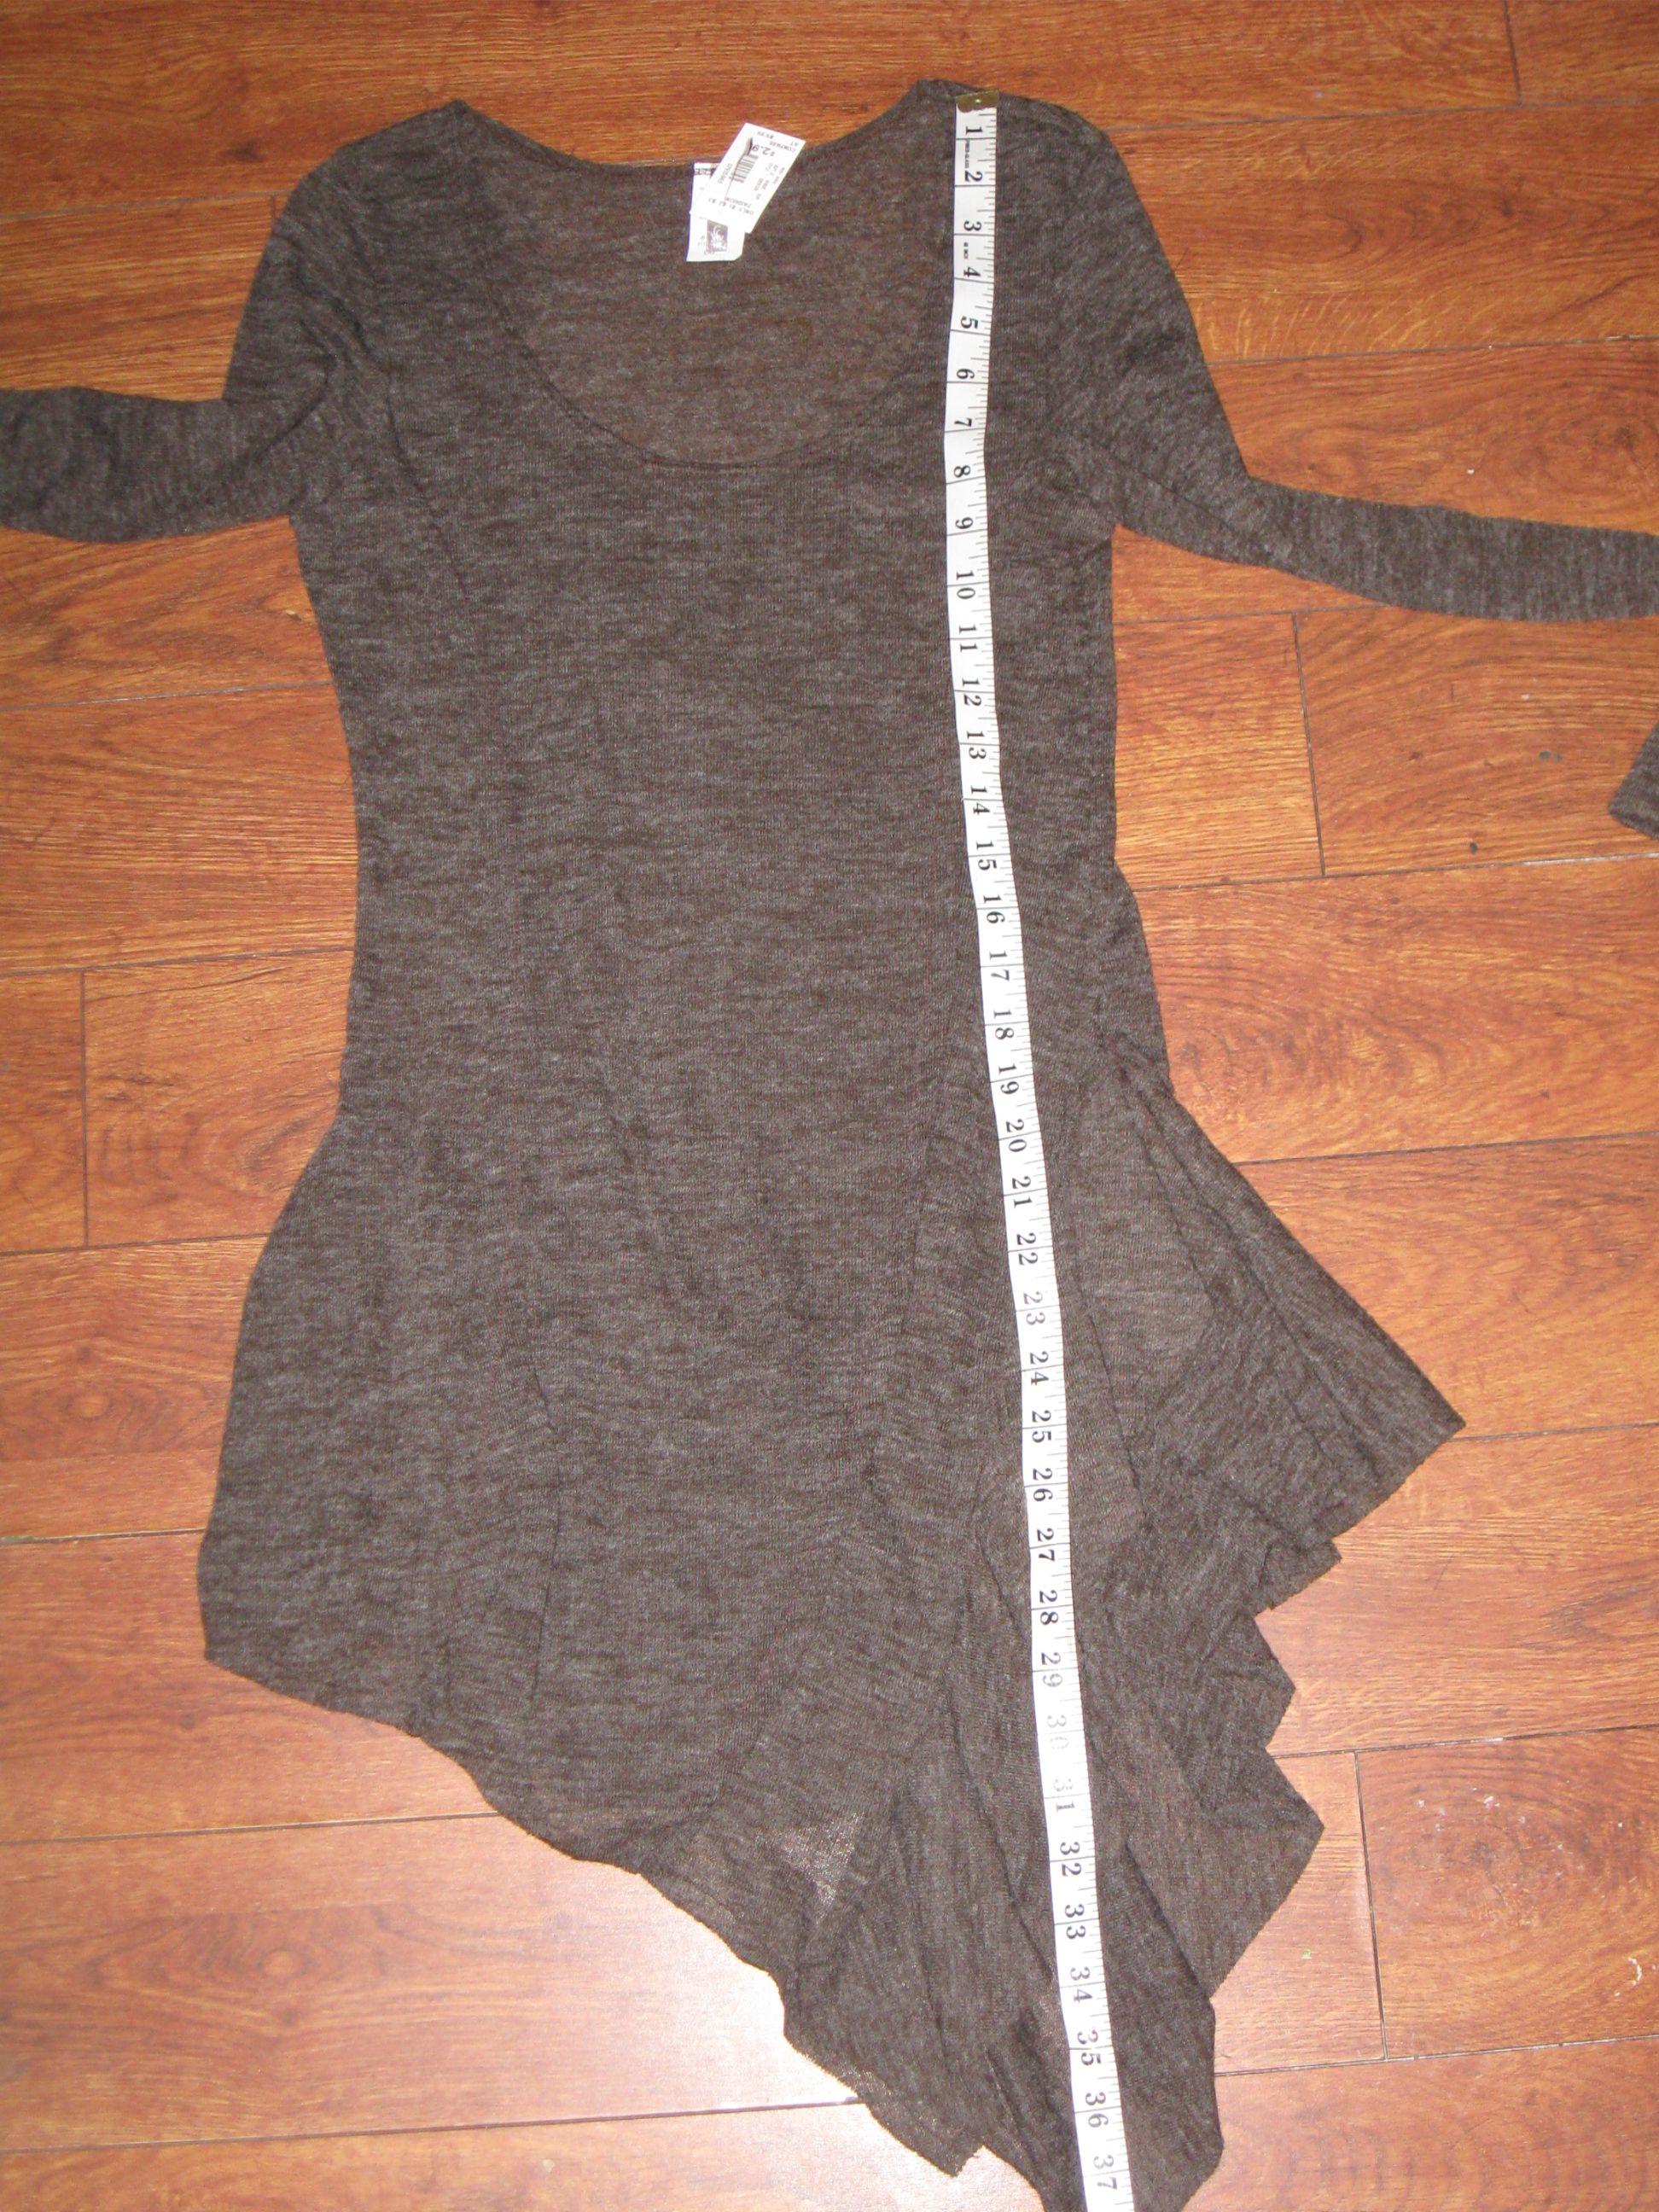 POINT Womens' Brown Knit Summer Long Sleeve Assymetic Hem Dress Tunic Sz S/M (L), NEW